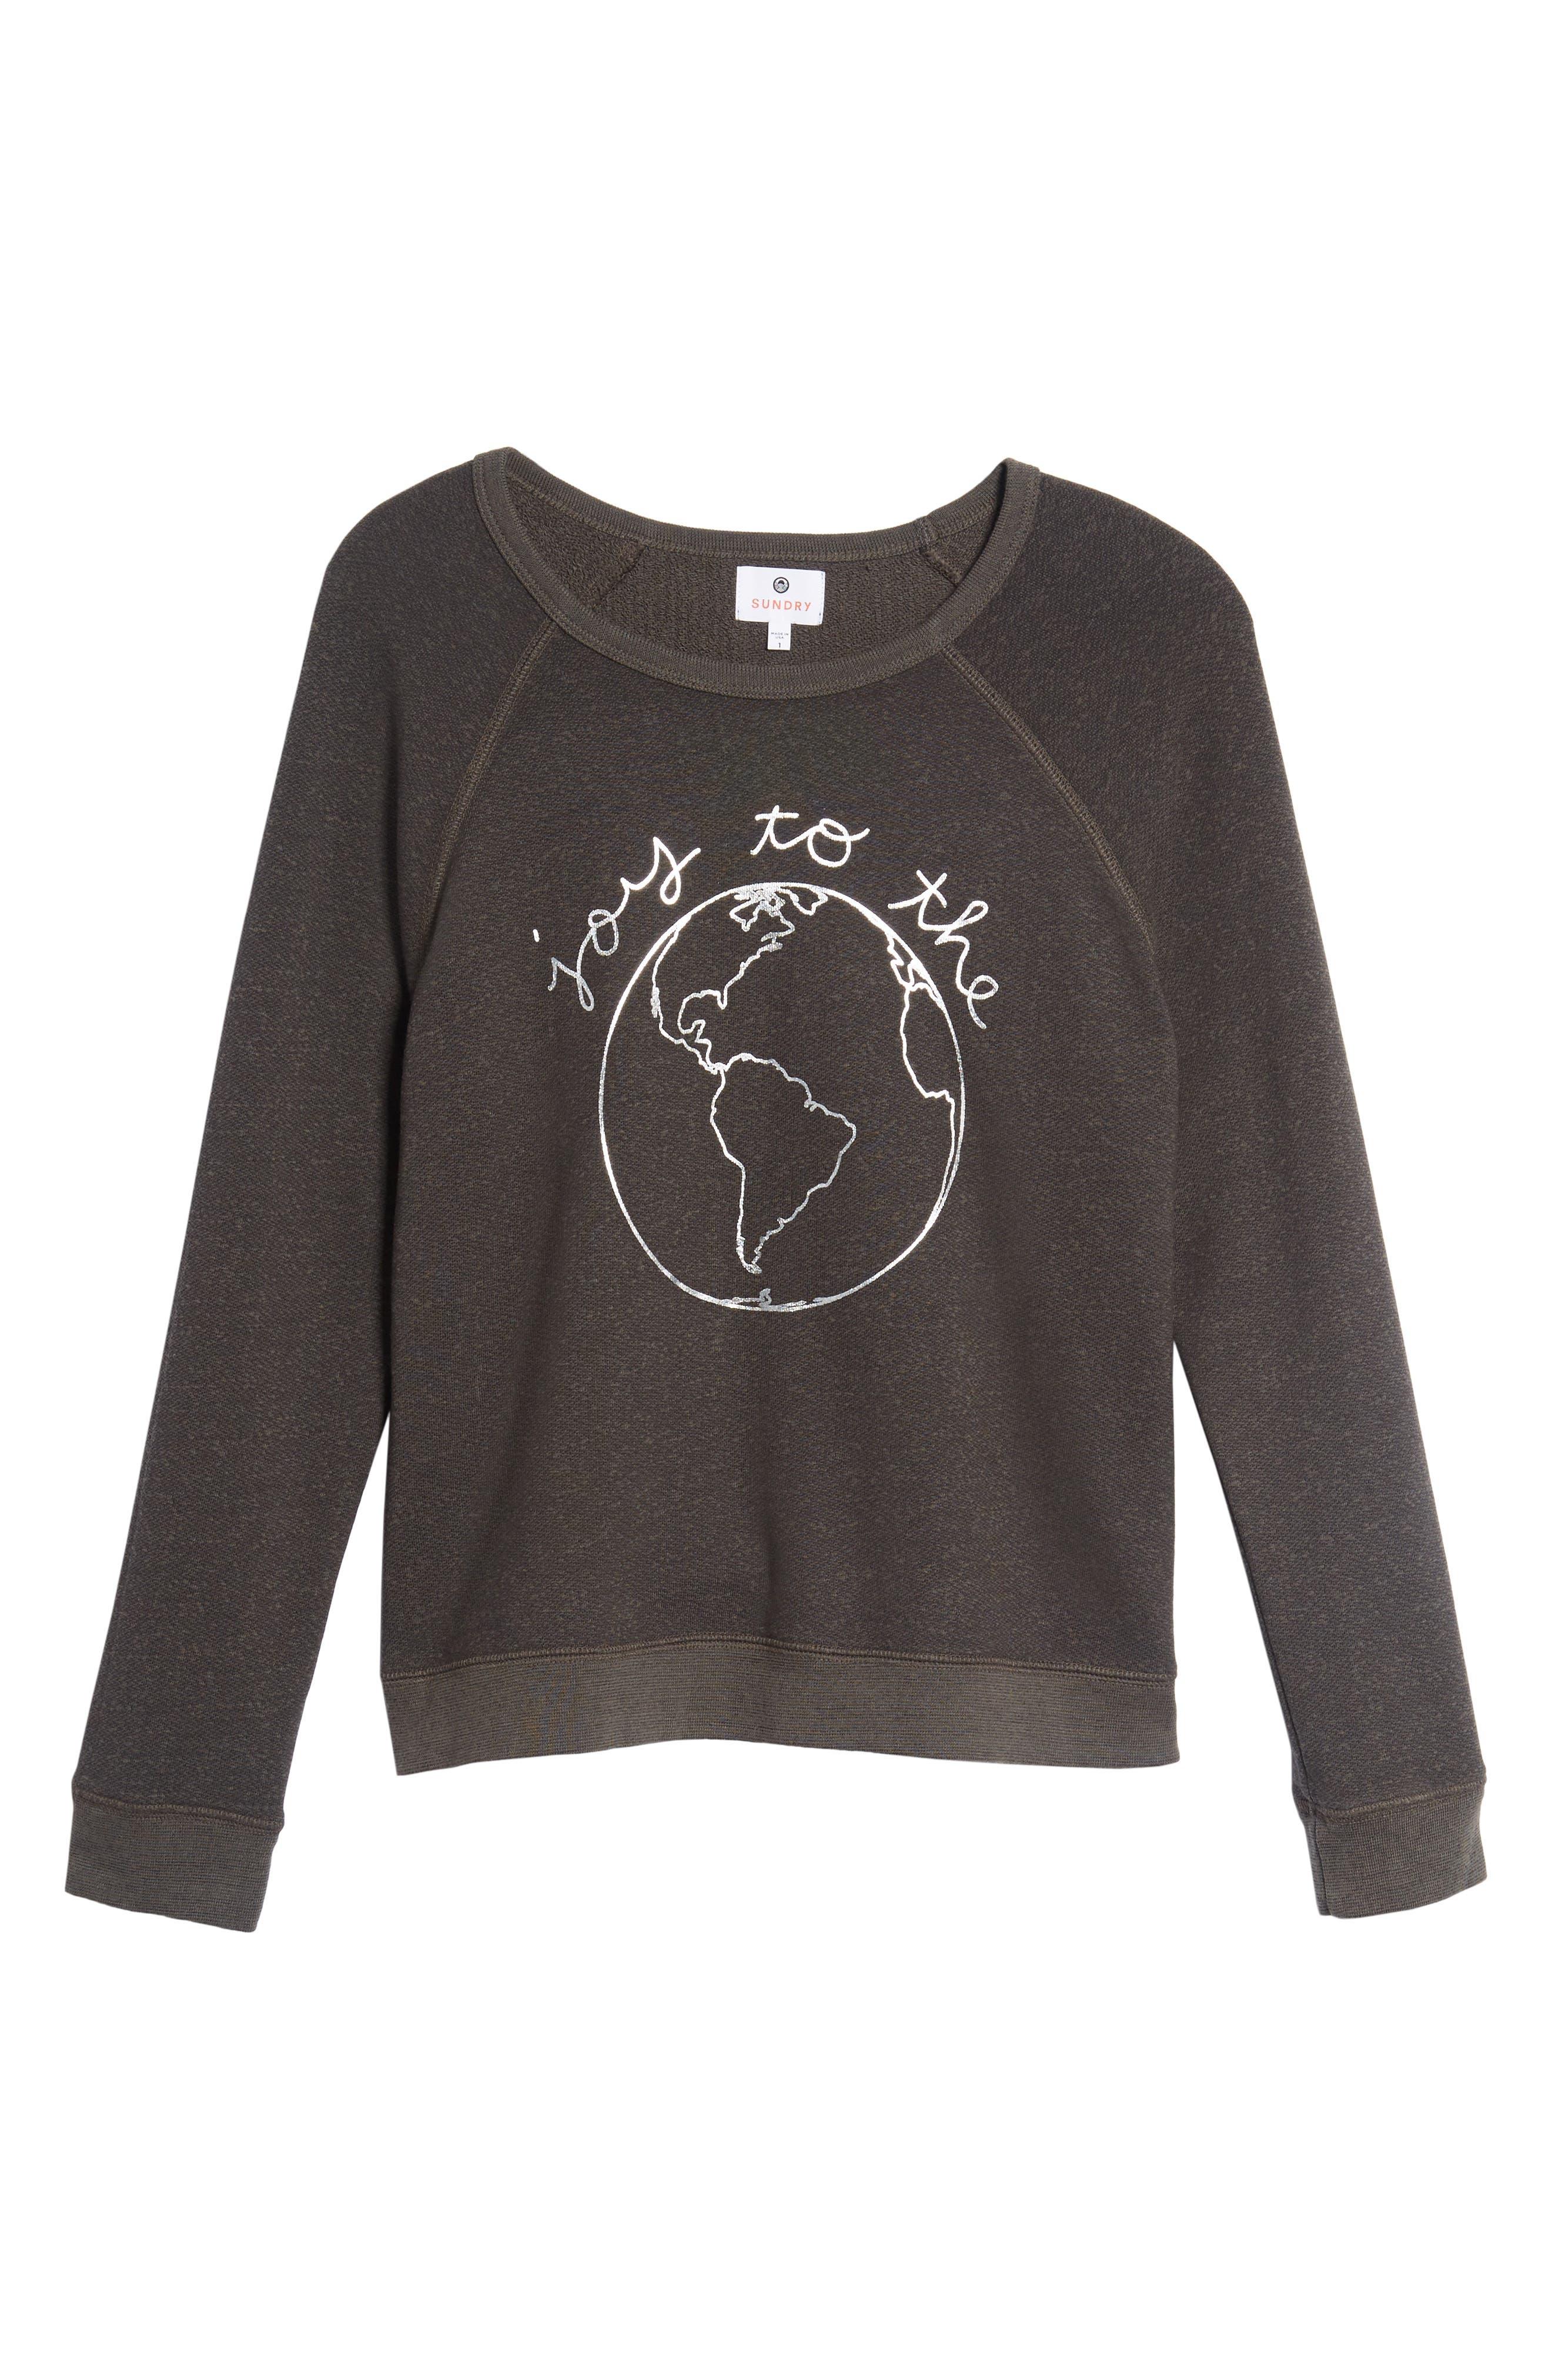 Joy to the World Sweatshirt,                             Alternate thumbnail 6, color,                             Black